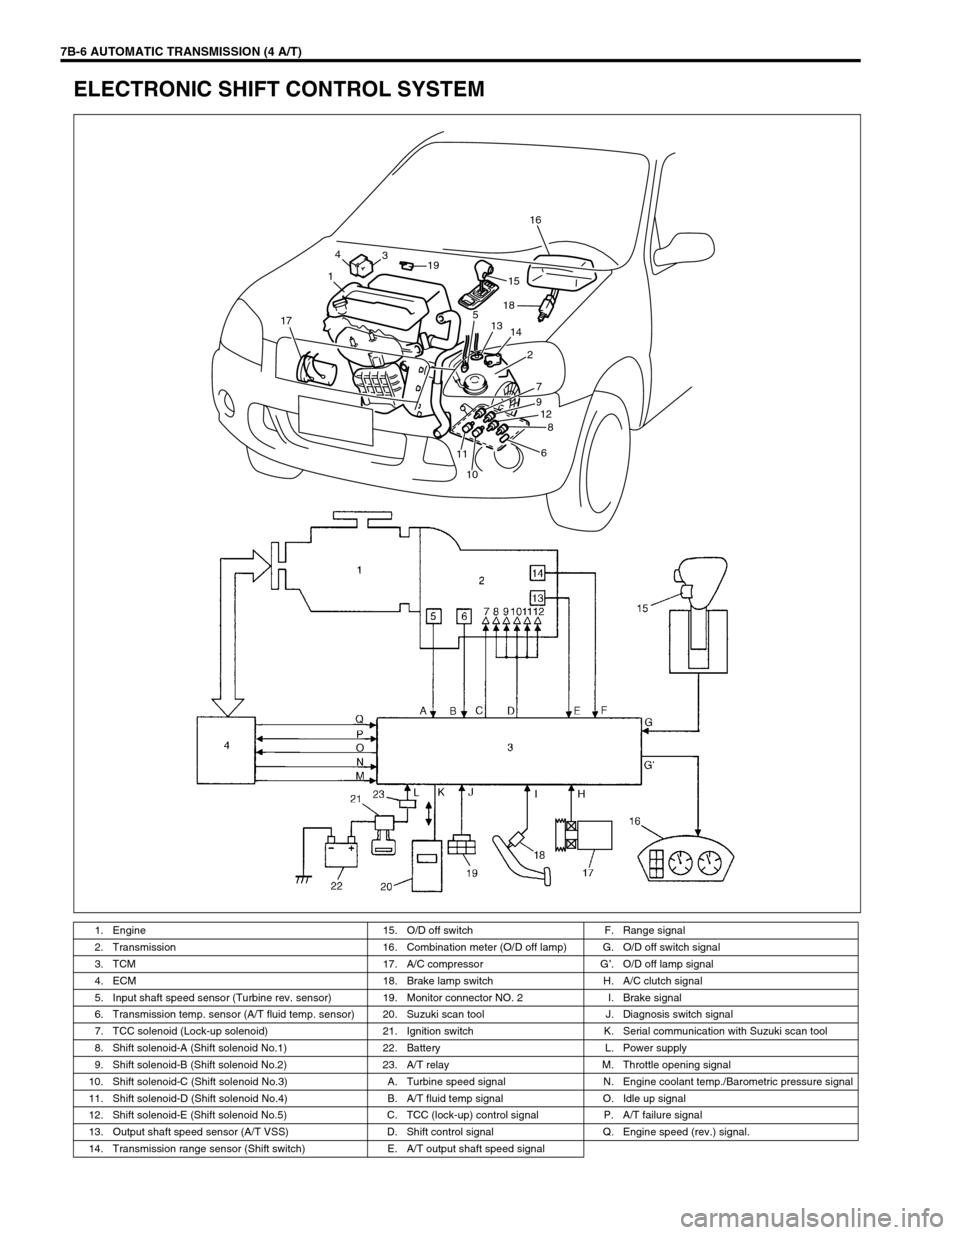 medium resolution of suzuki swift 2000 1 g transmission service workshop manual page 48